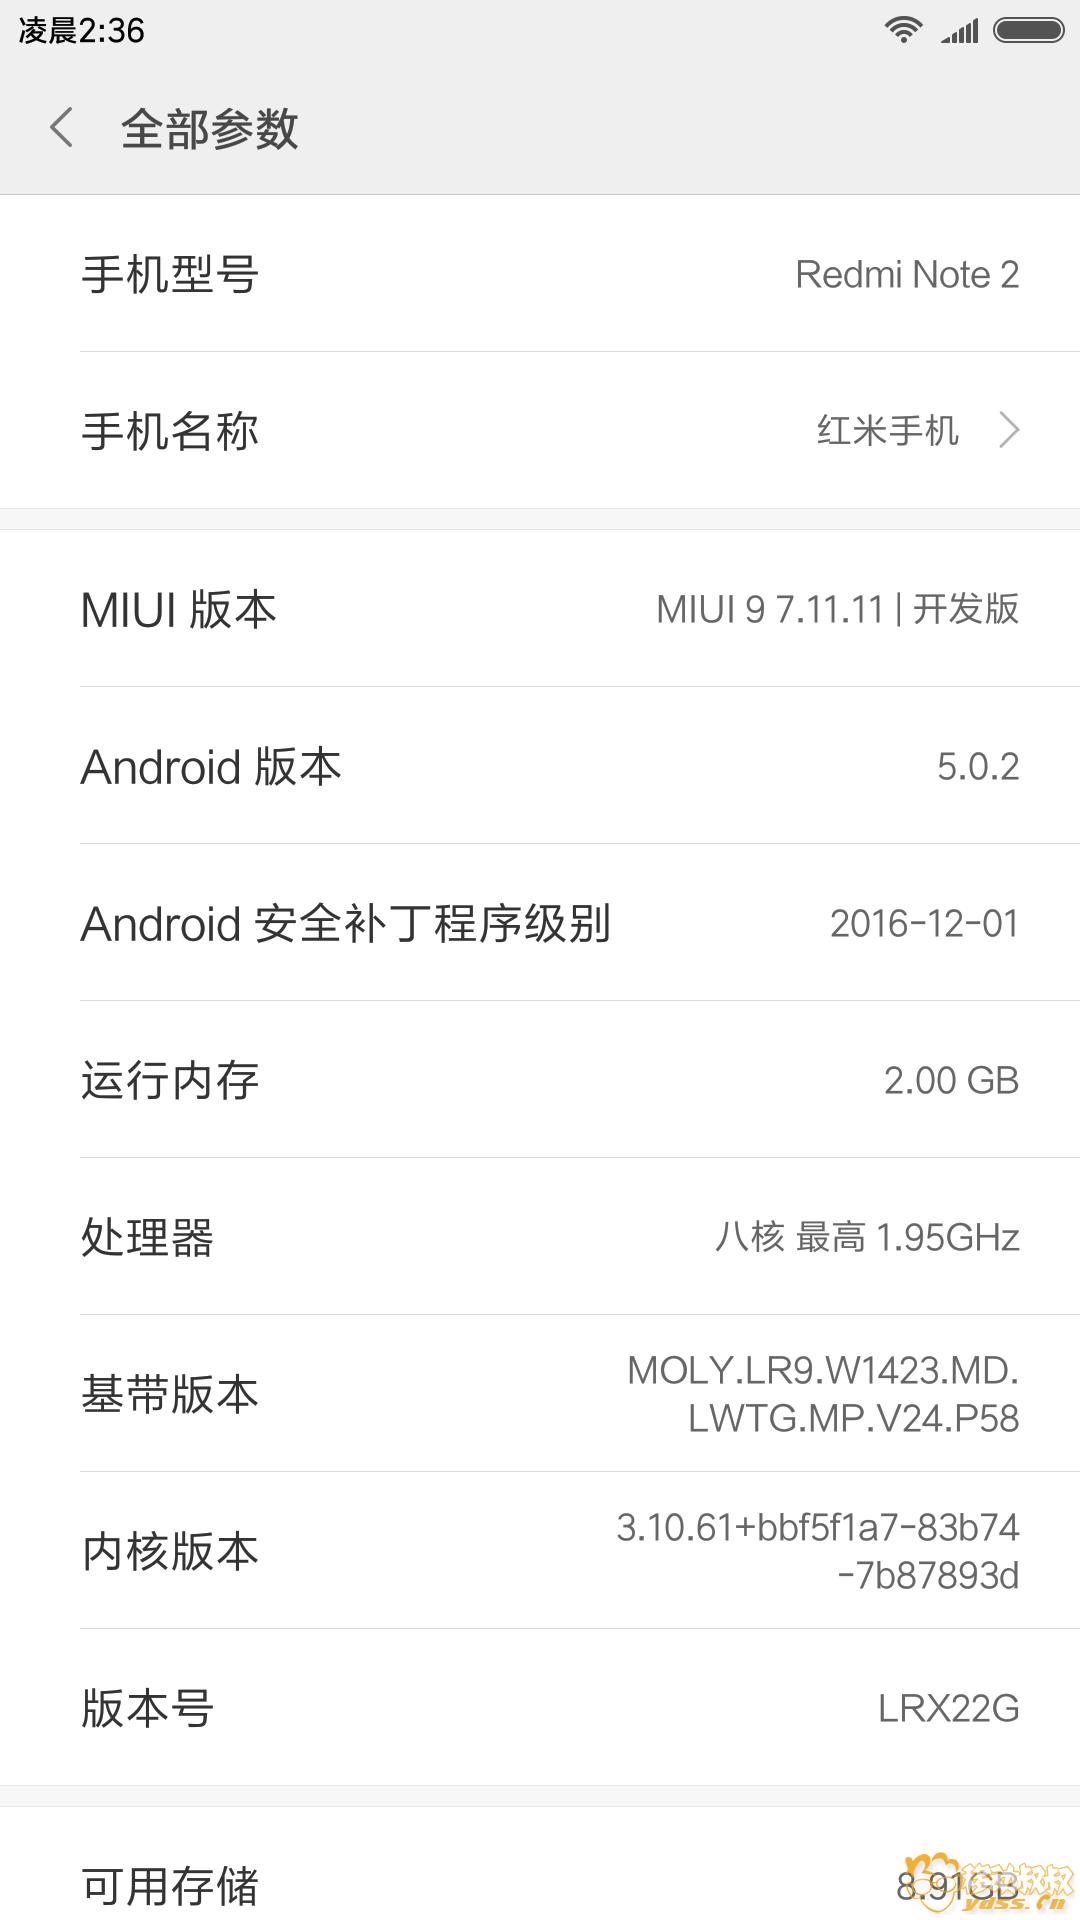 Screenshot_2017-11-14-20-29-39-791_com.android.settings.png